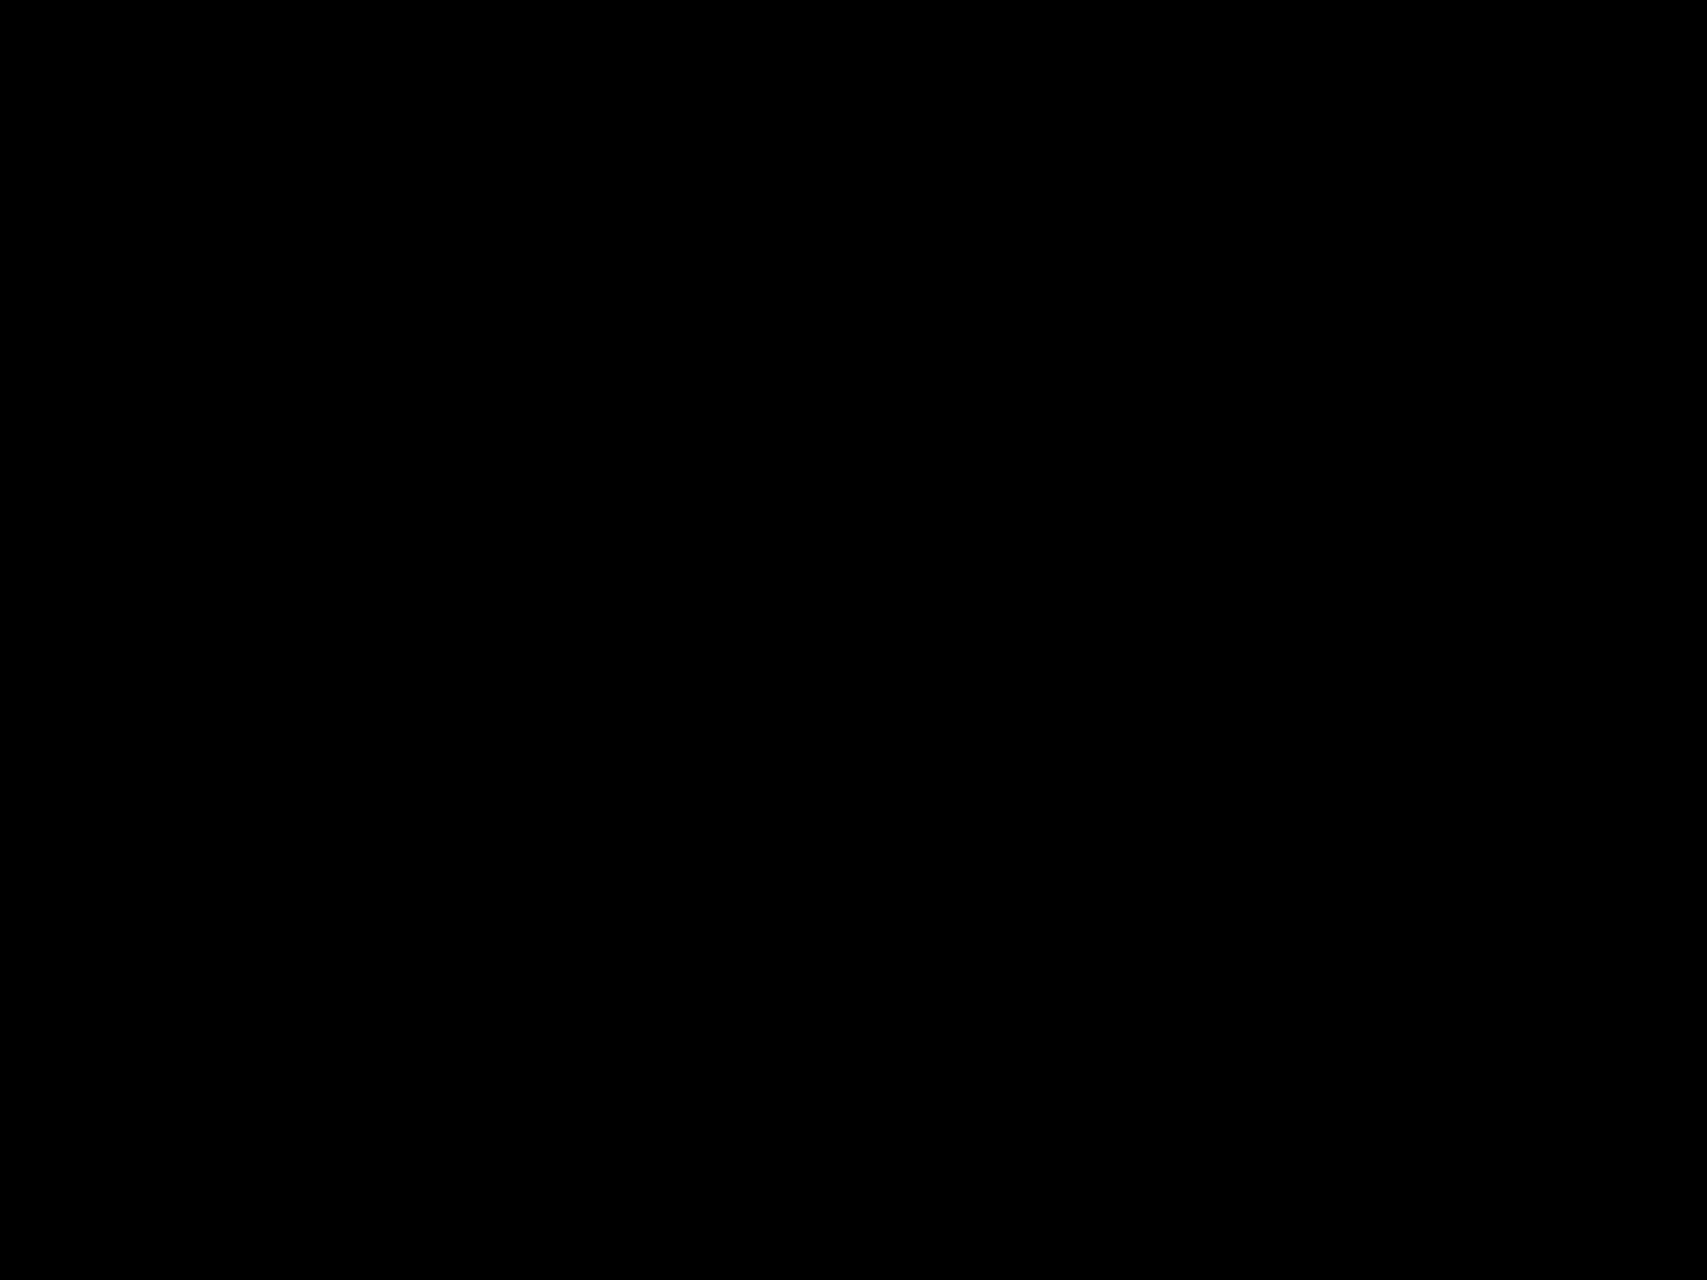 20180730_03018